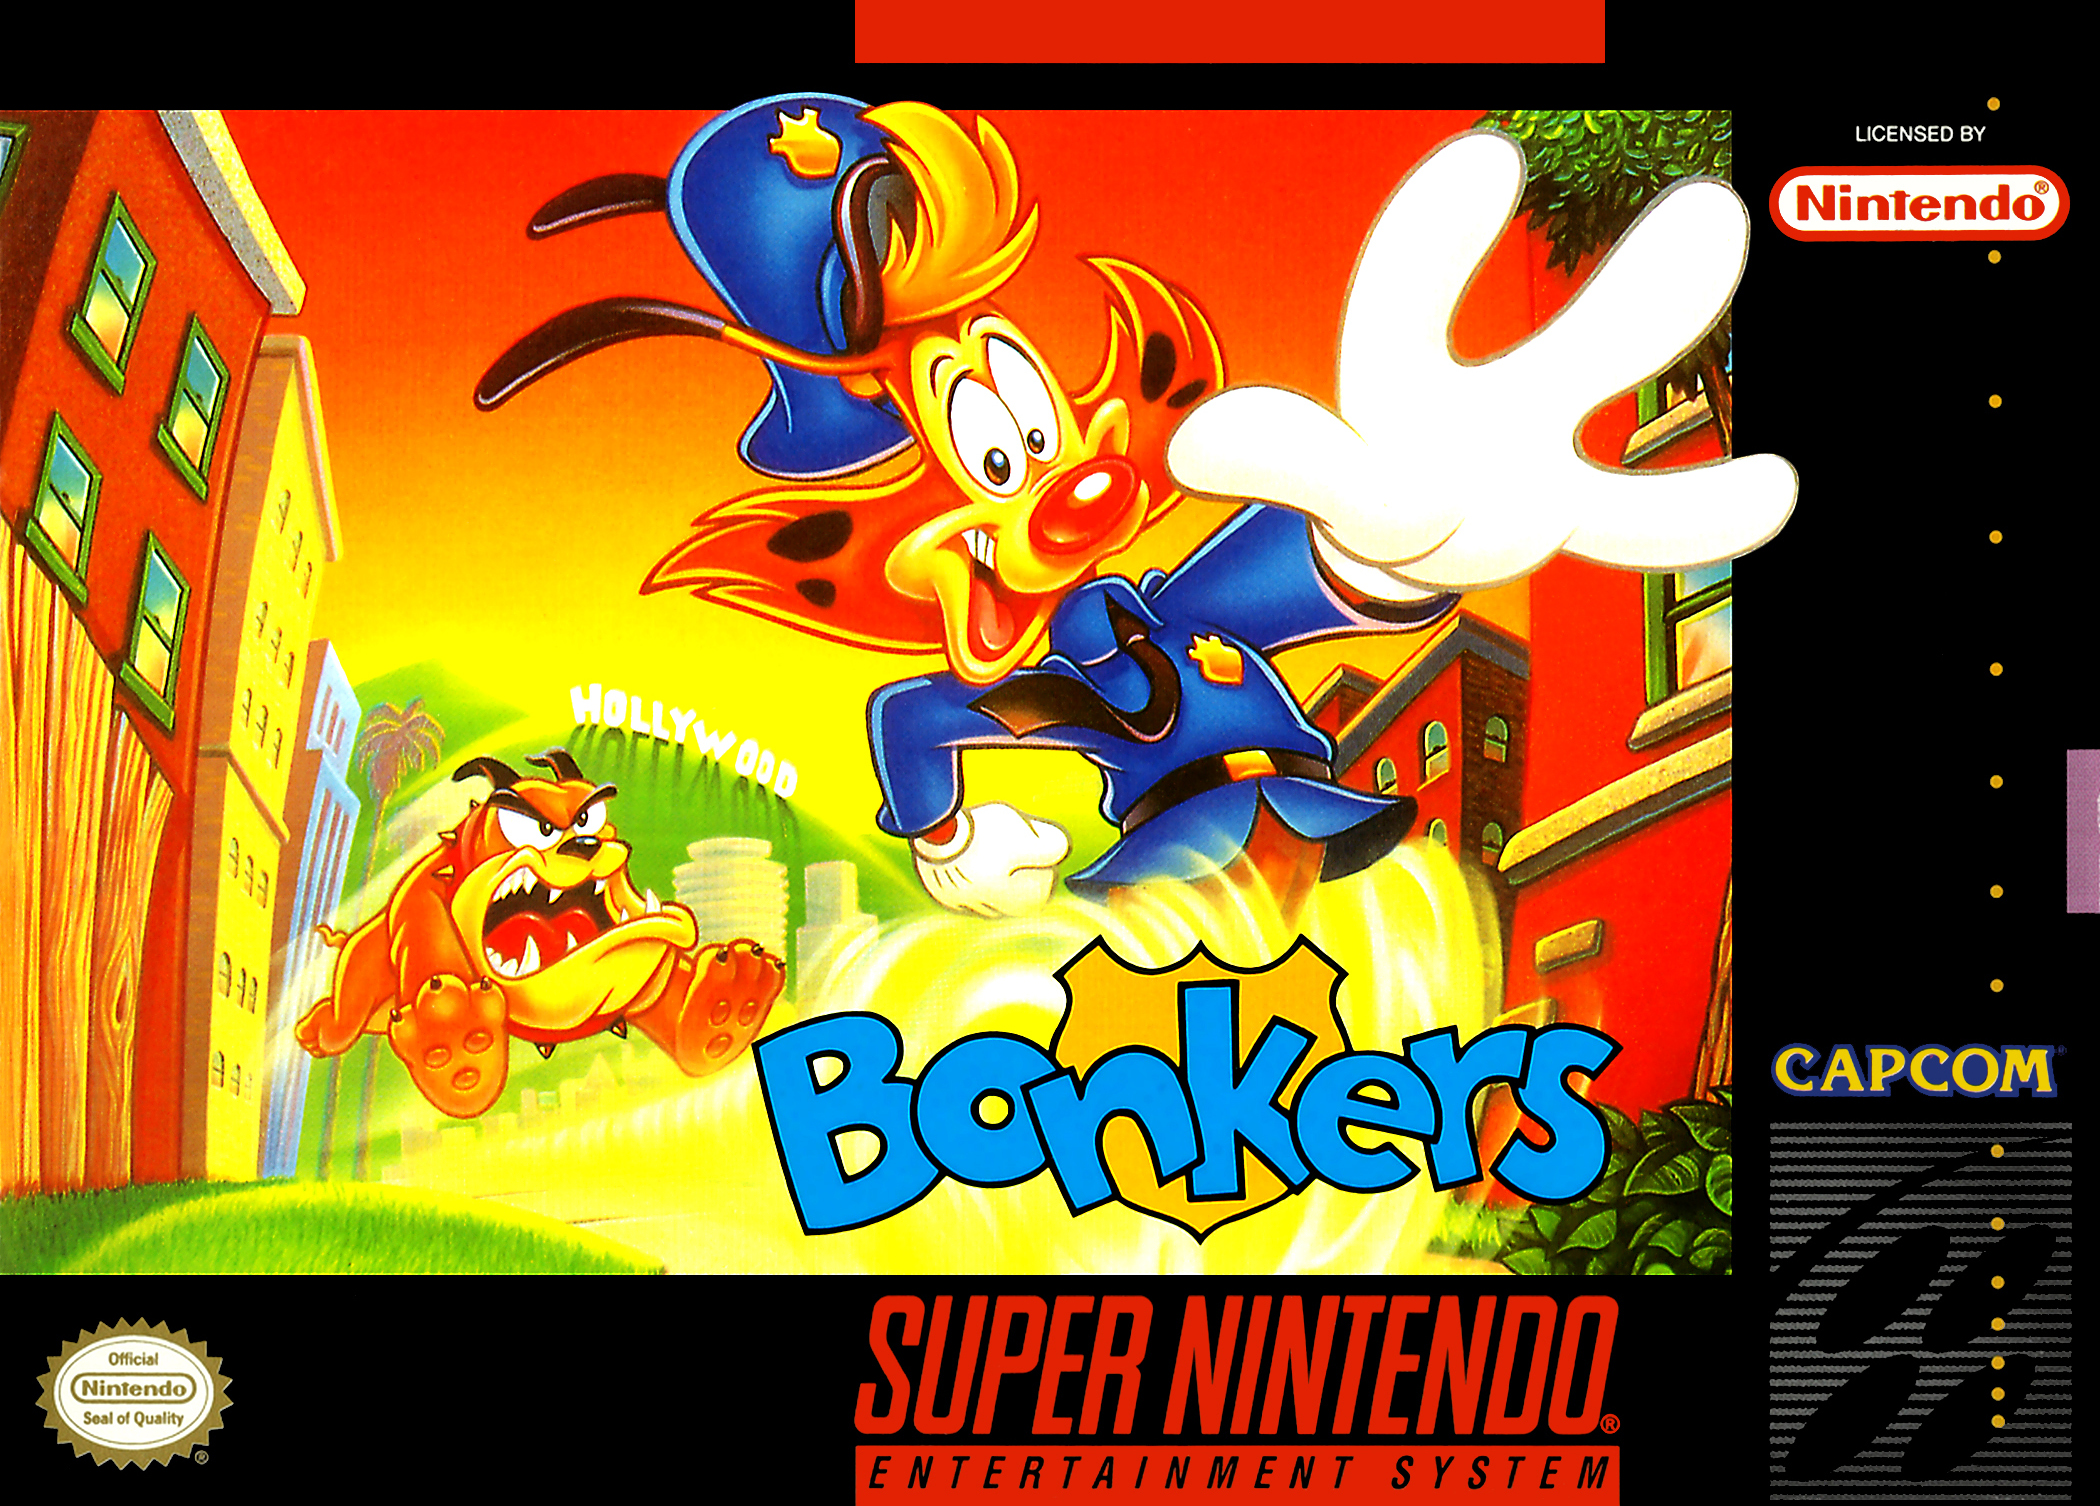 Bonkers/SNES